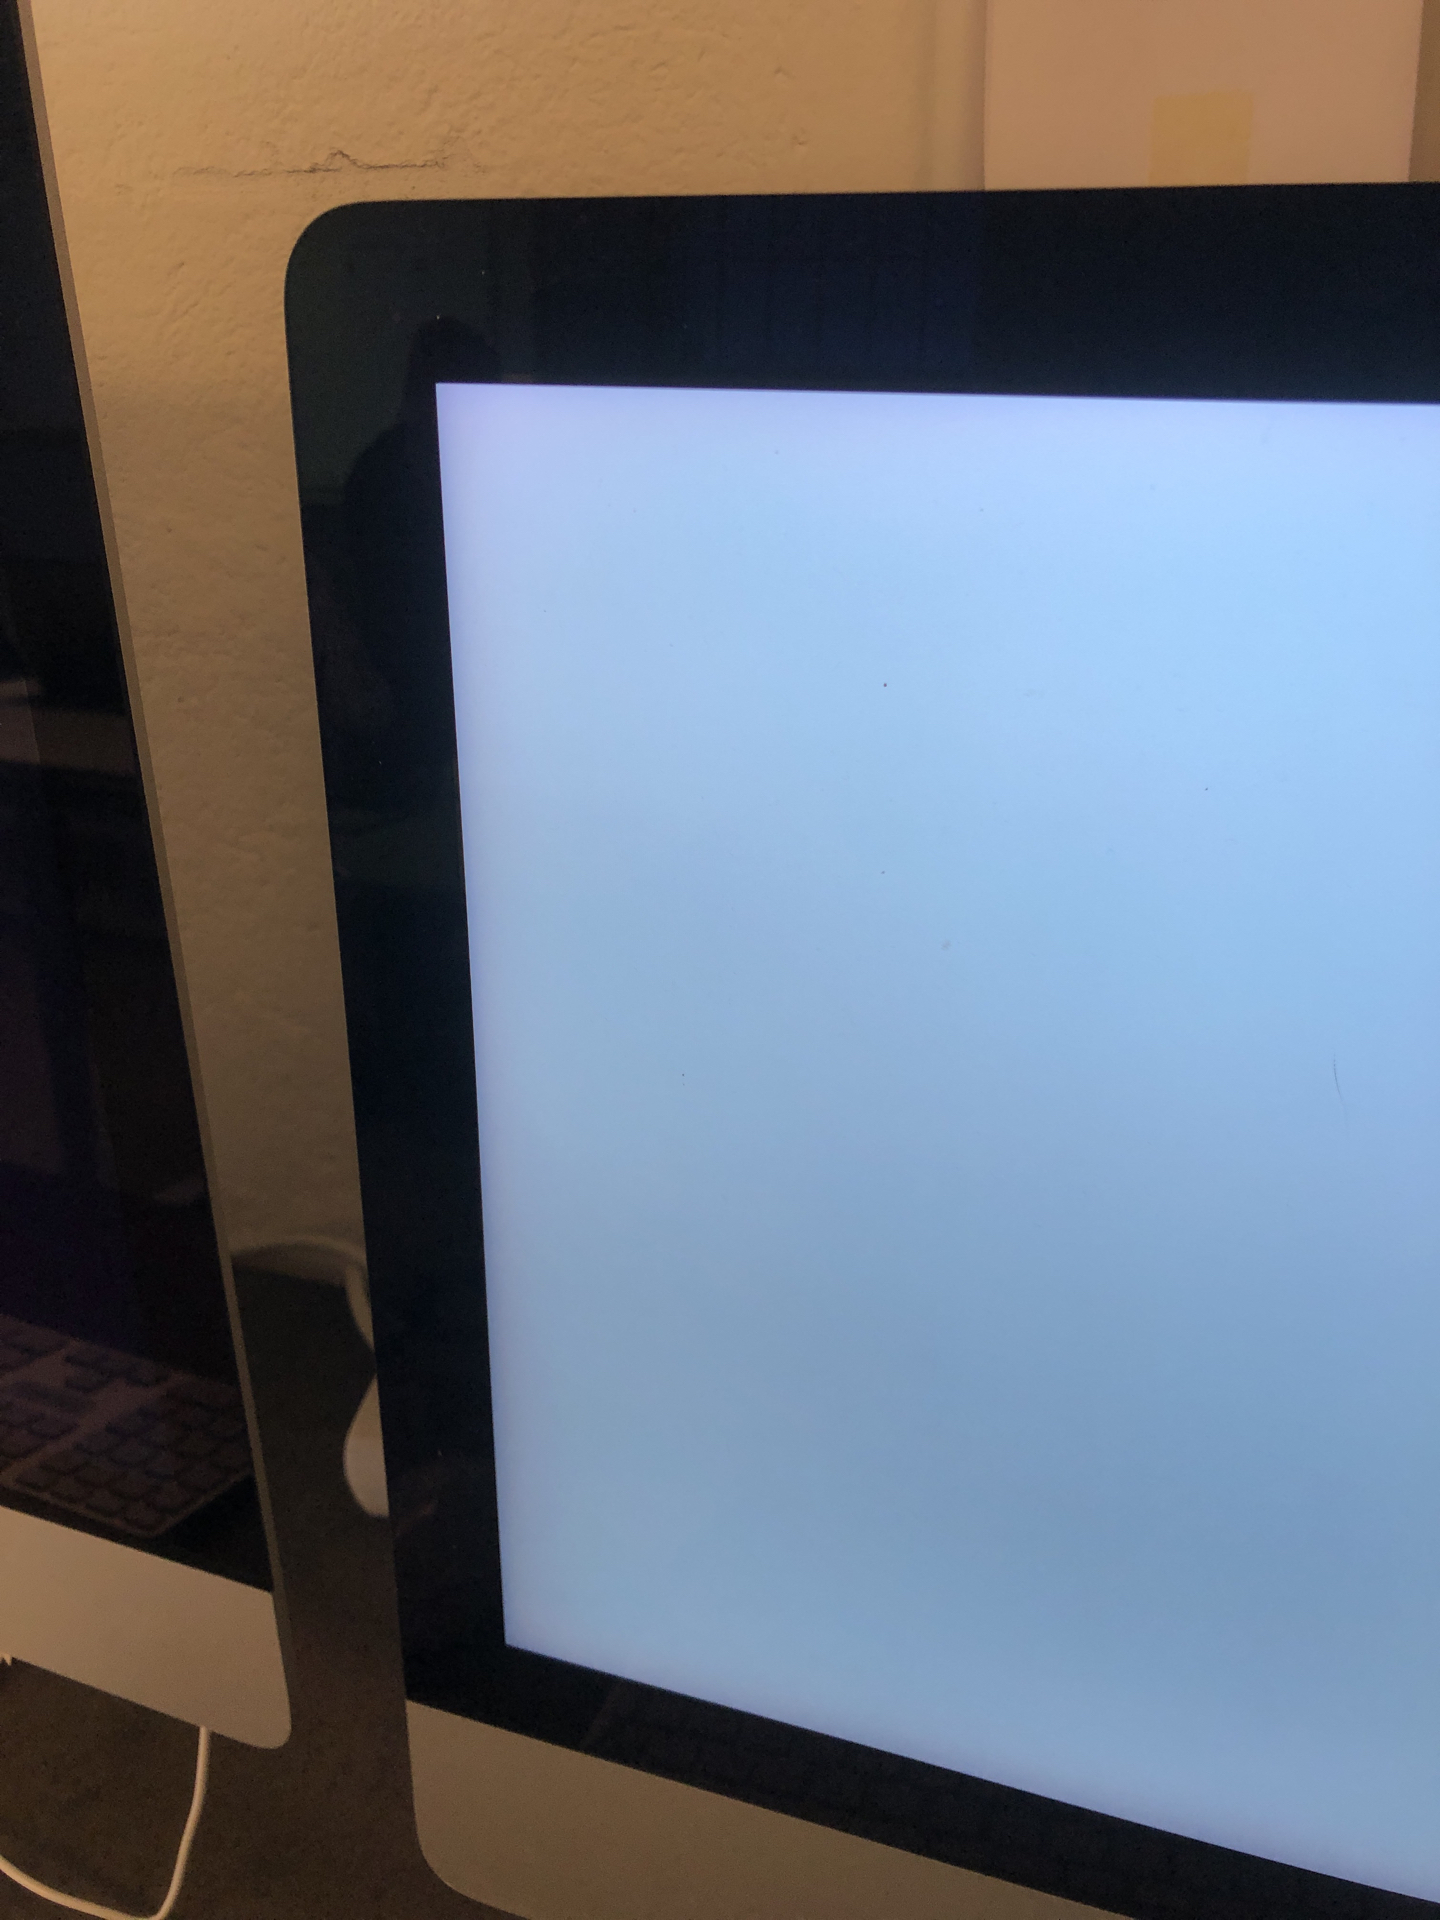 "iMac 21.5"" Retina 4K Late 2015 (Intel Quad-Core i7 3.3 GHz 8 GB RAM 1 TB HDD), Intel Quad-Core i7 3.3 GHz, 8 GB RAM, 1 TB HDD, Afbeelding 3"